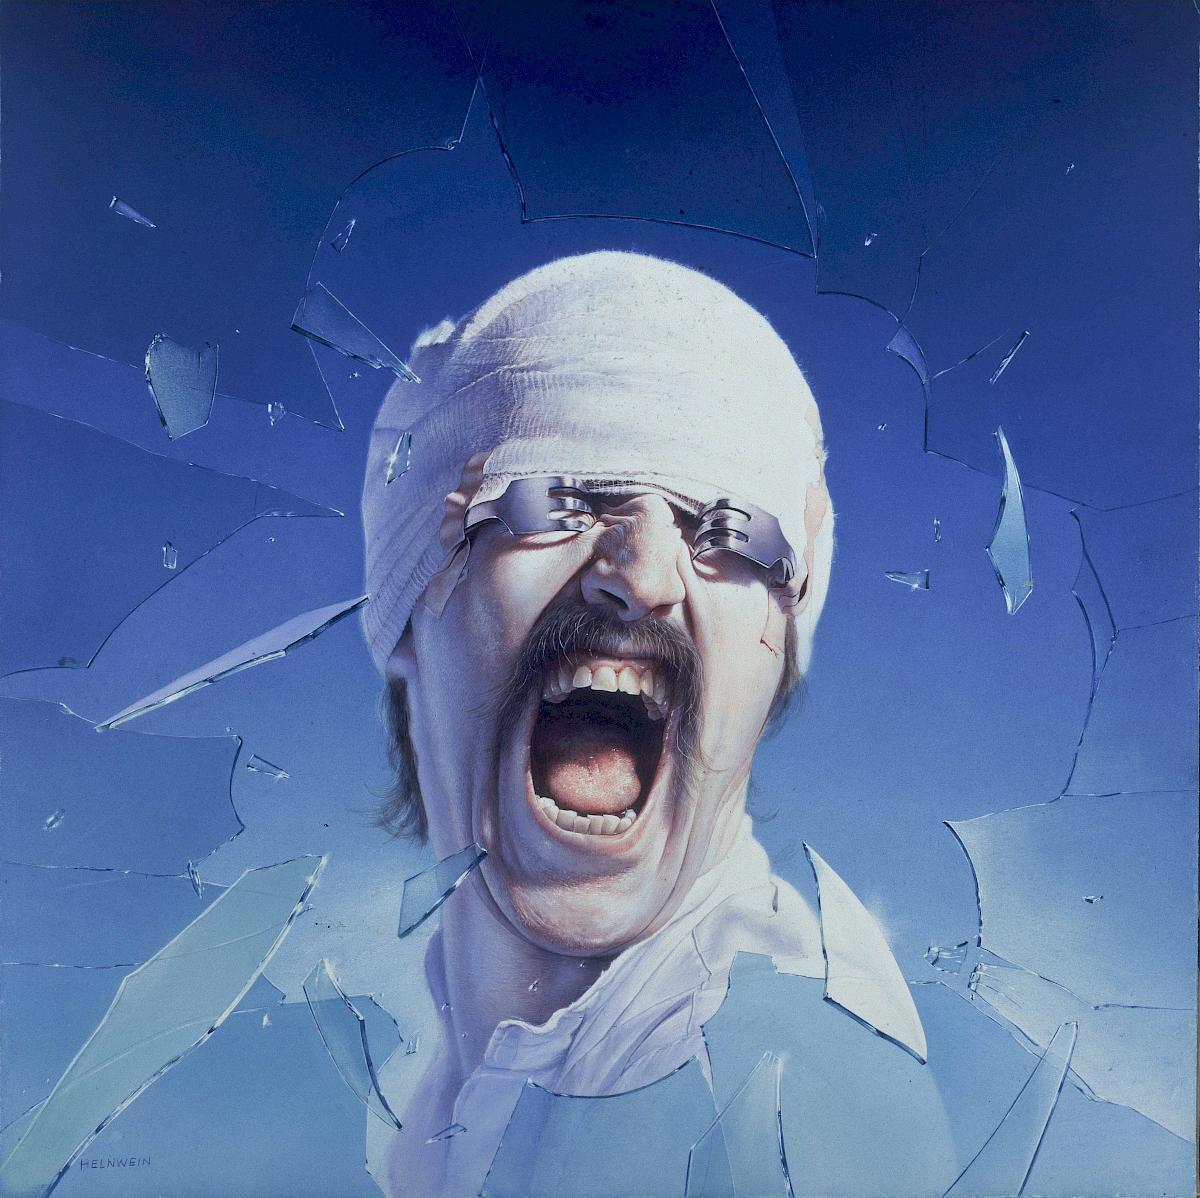 Gottfried Helnwein: Self-portrait Blackout